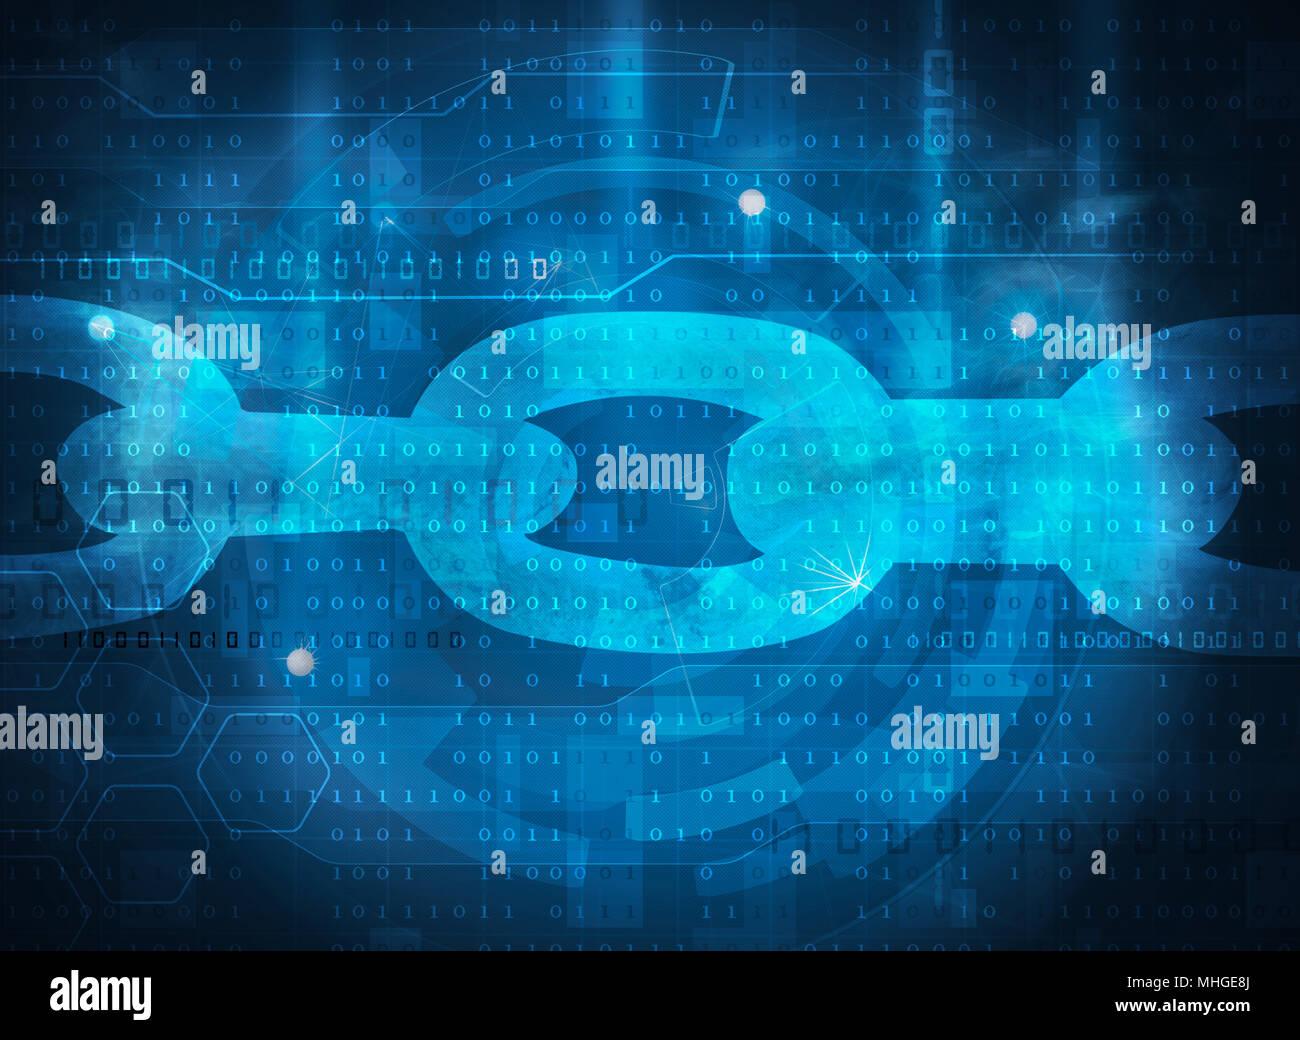 blockchain technology concept blue background - Stock Image